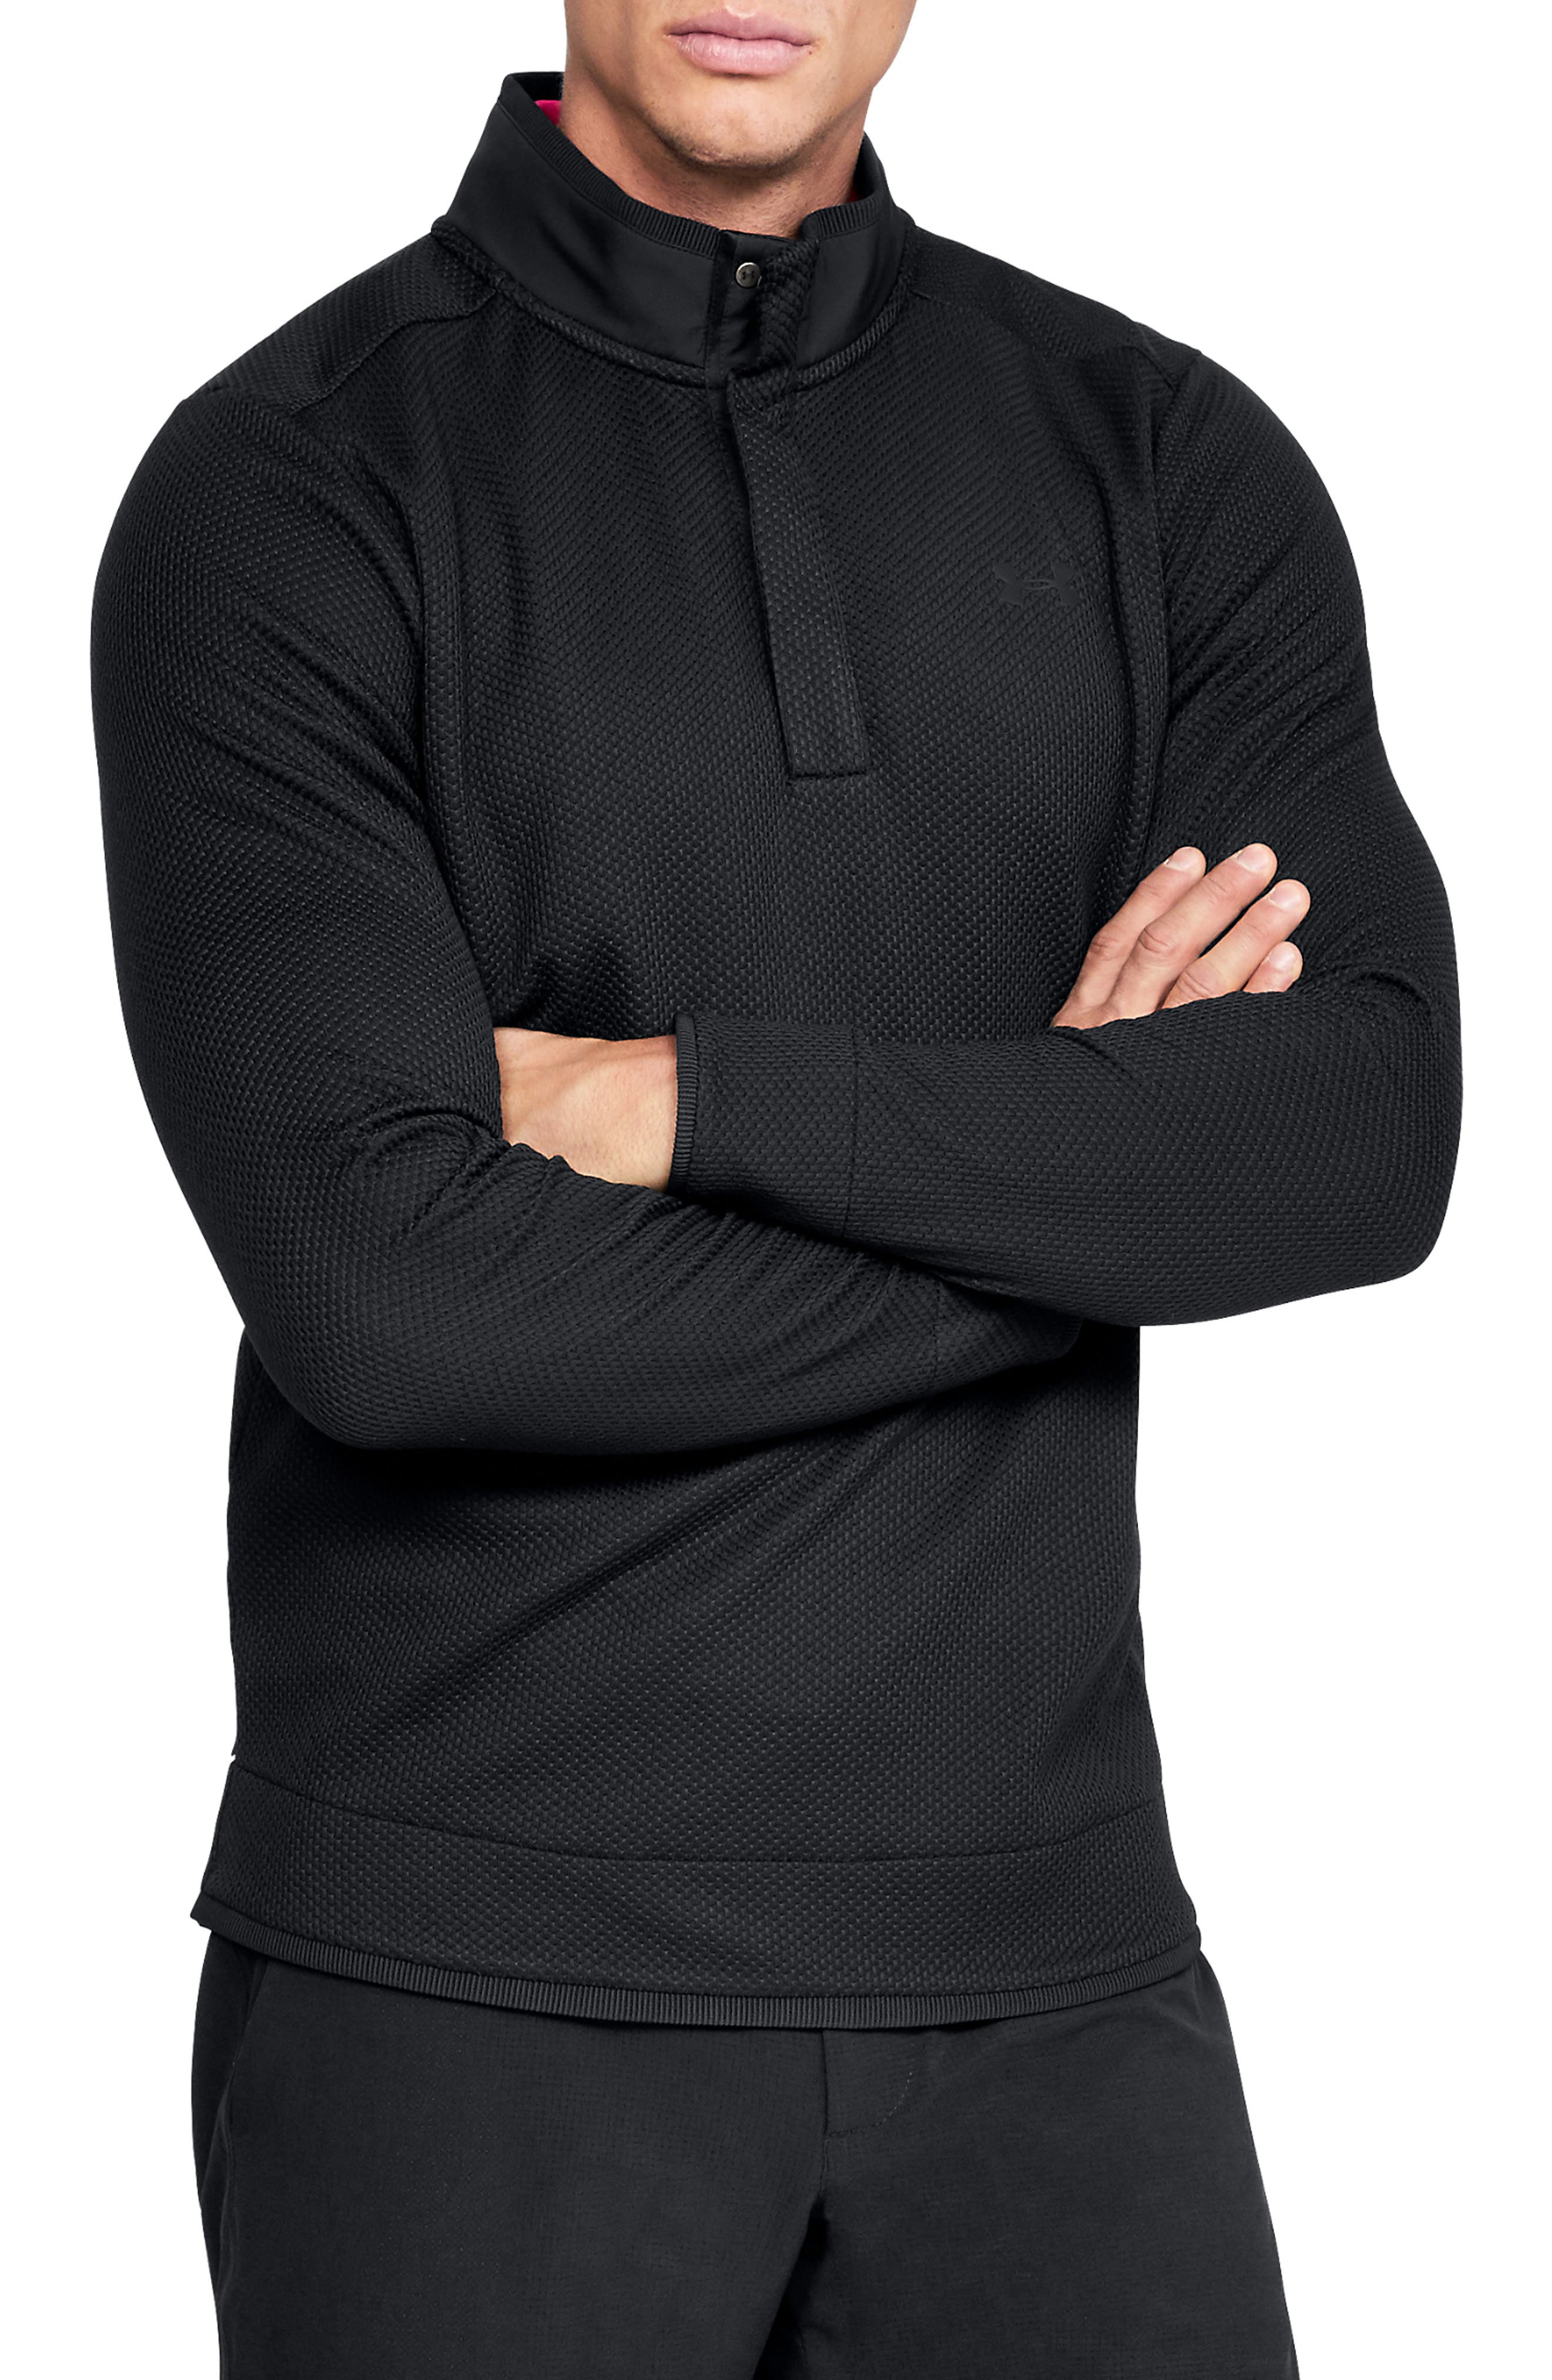 Under Armour Storm Sweaterfleece Snap Mock Neck Pullover, Black